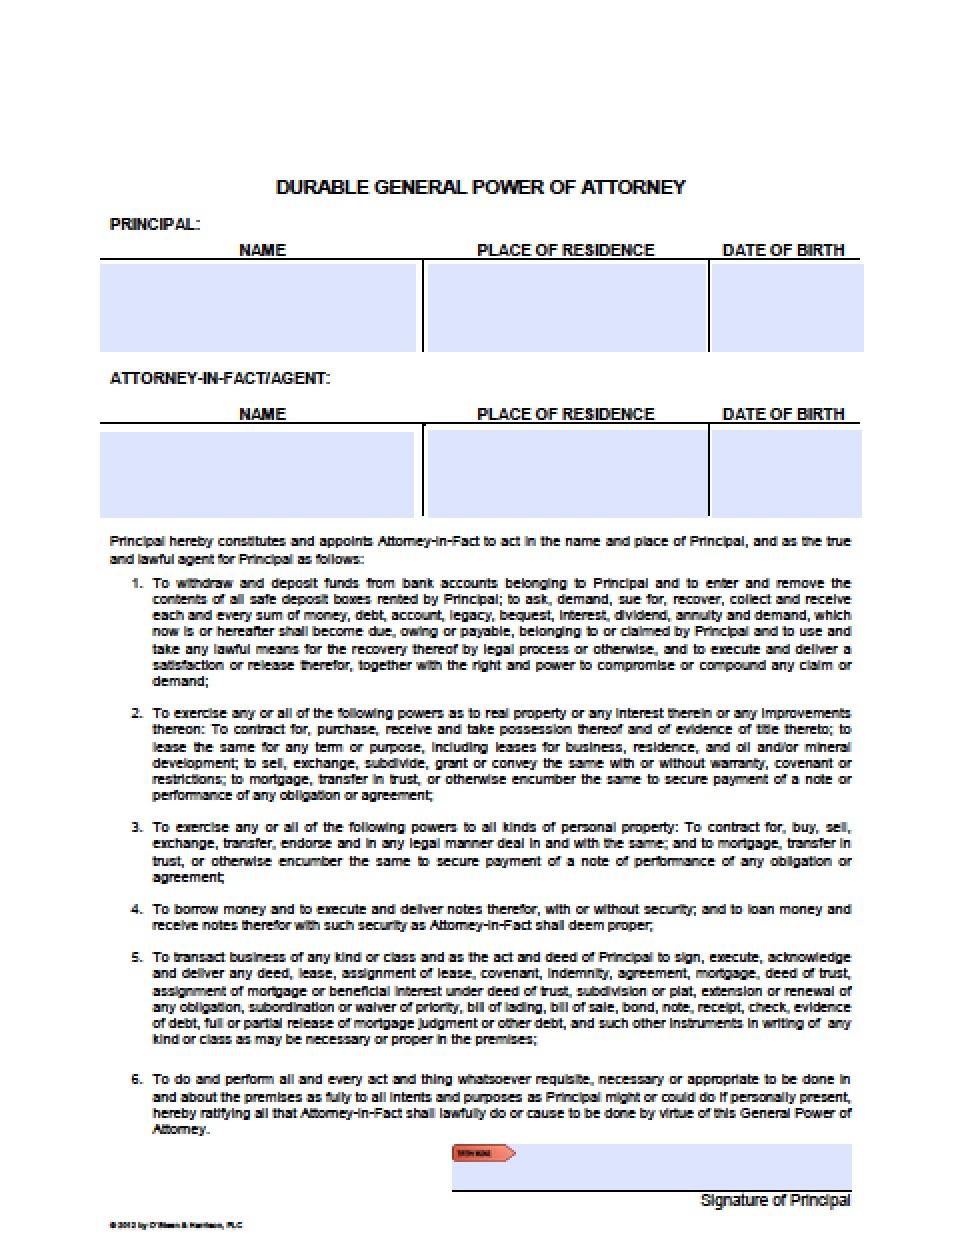 Free Arizona Power Of Attorney Forms In Fillable Pdf | 9 Types - Free Printable Power Of Attorney Form Washington State